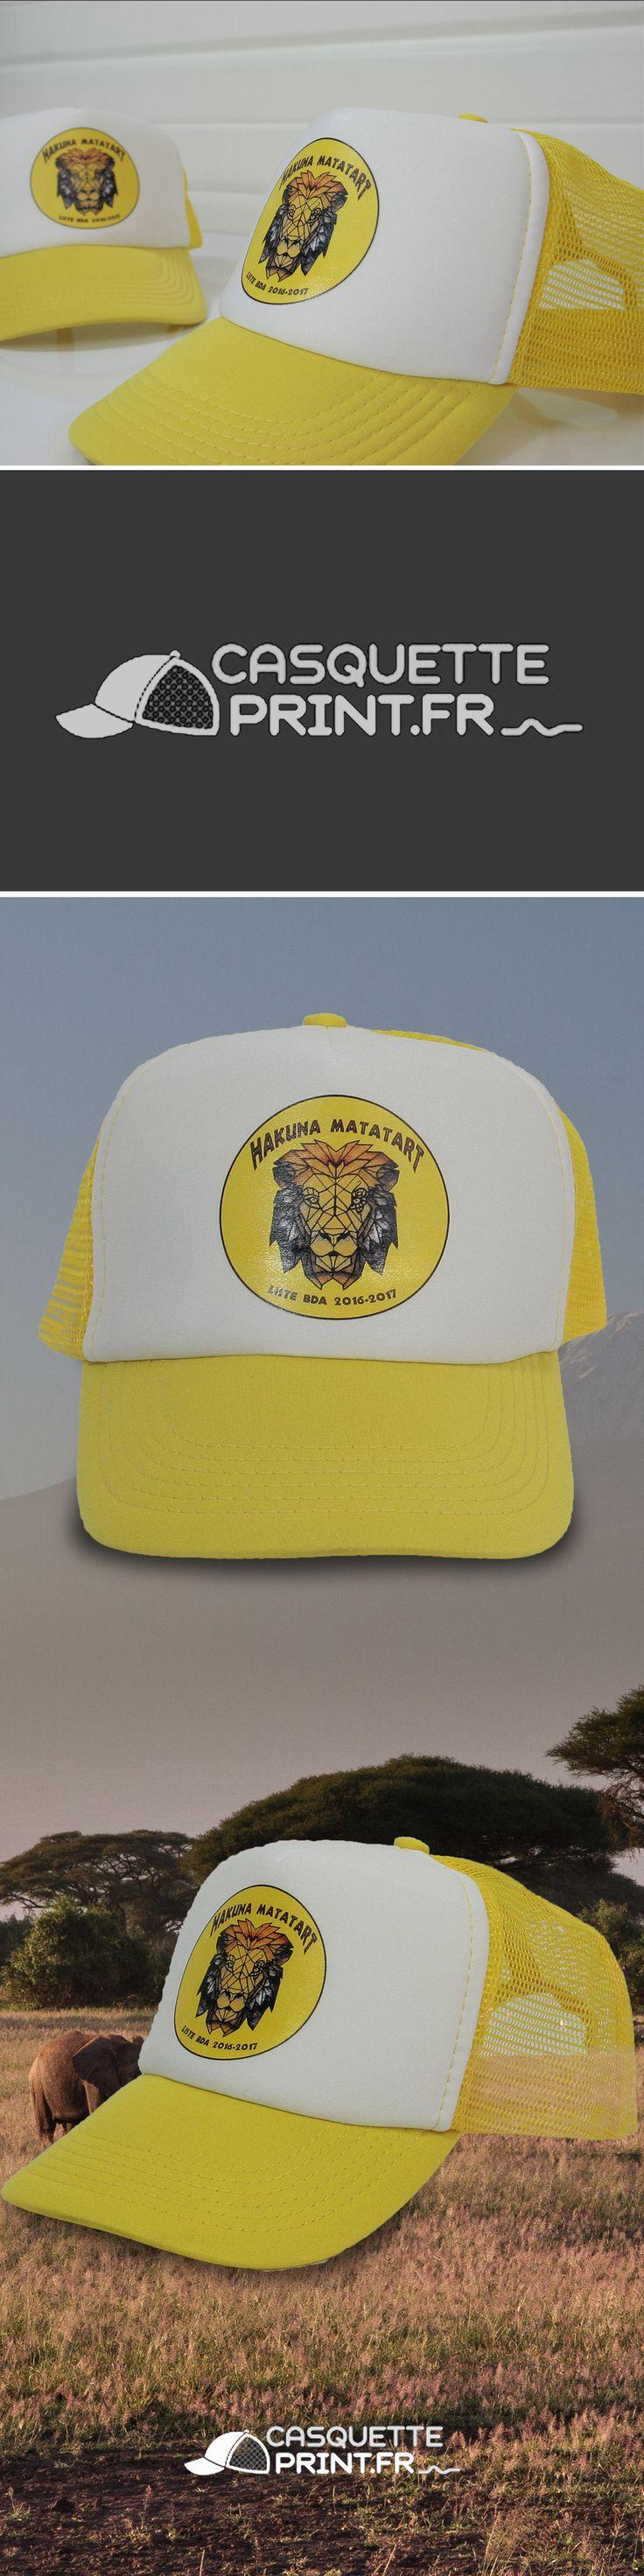 #casquette #trucker #yupoong #snapback #bonnet #casquettes #personnaliser #personnalisation #goodies #mode #fashion #gift #tendance